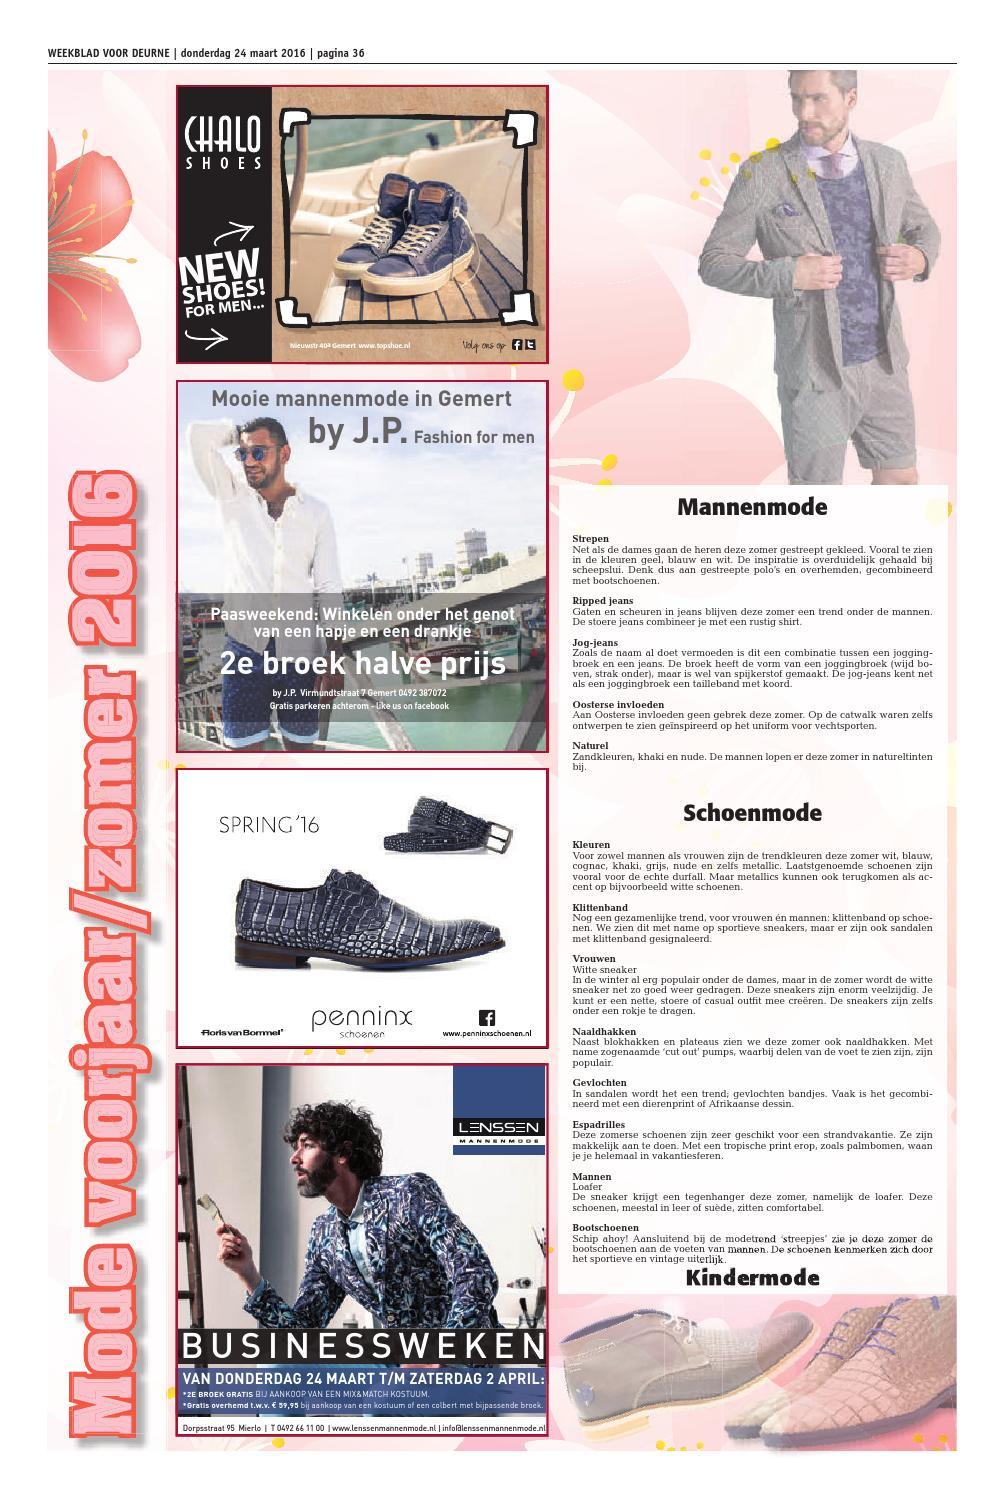 Joggingbroek Van Spijkerstof.Weekblad Voor Deurne Wk12 By Das Publishers Issuu